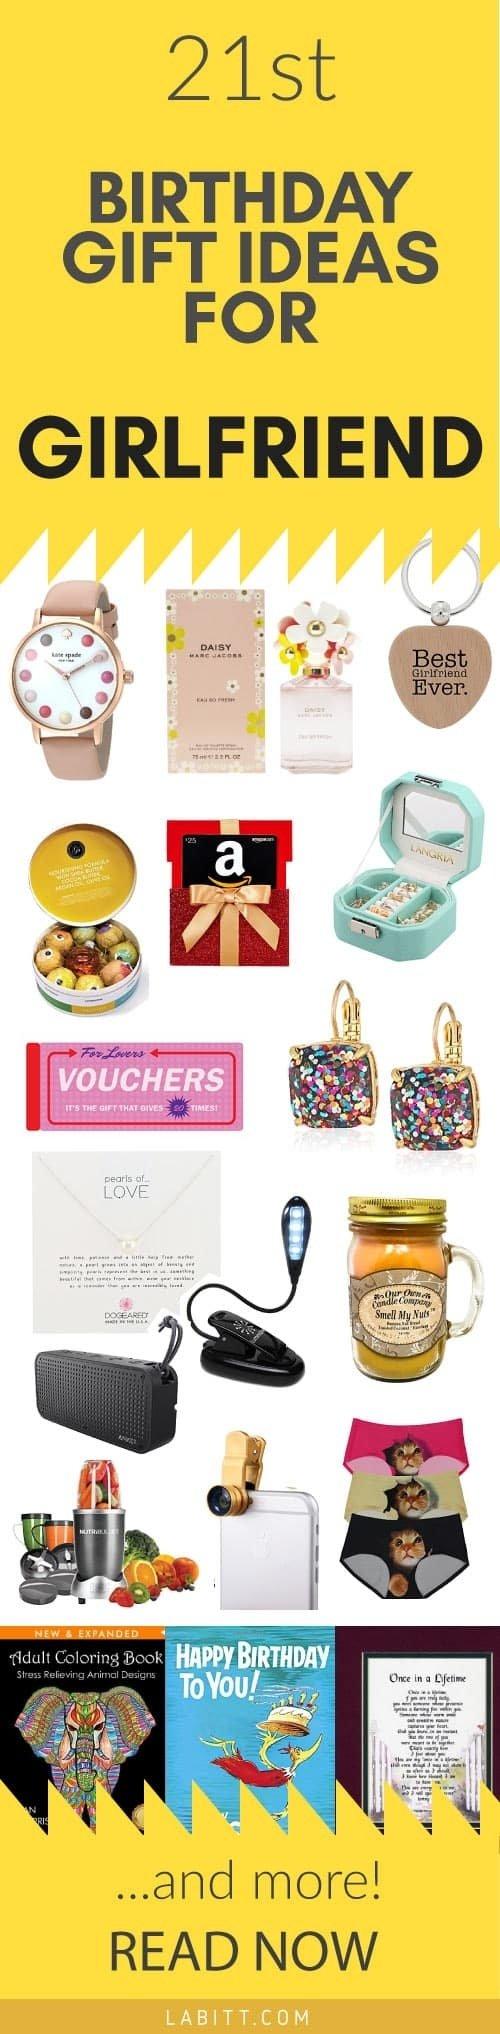 10 Attractive Birthday Present Ideas For Girlfriend Creative 21st Gift